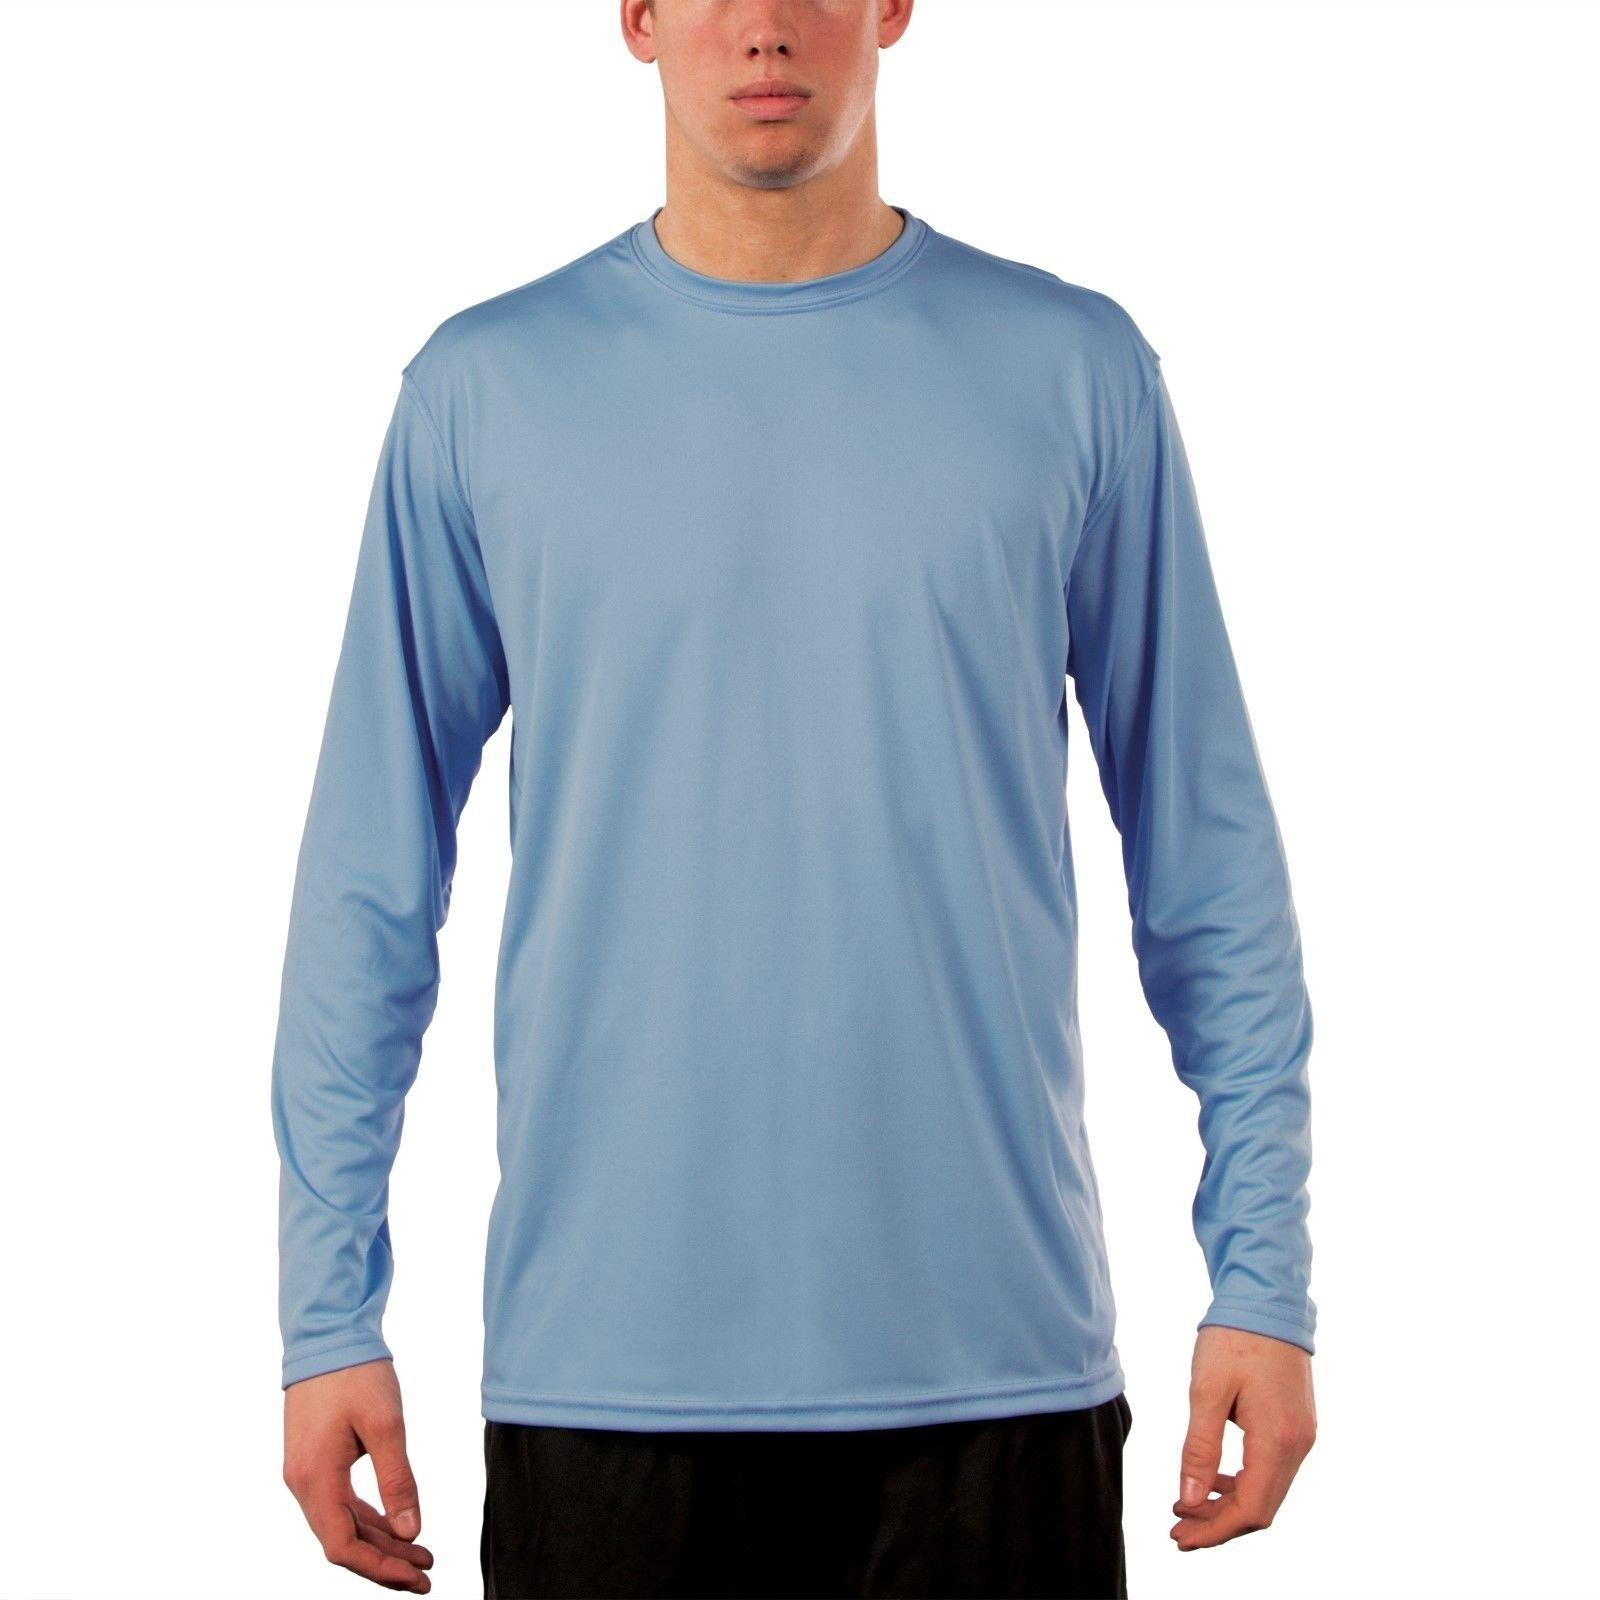 Mens Microfiber Shirts Long Sleeve